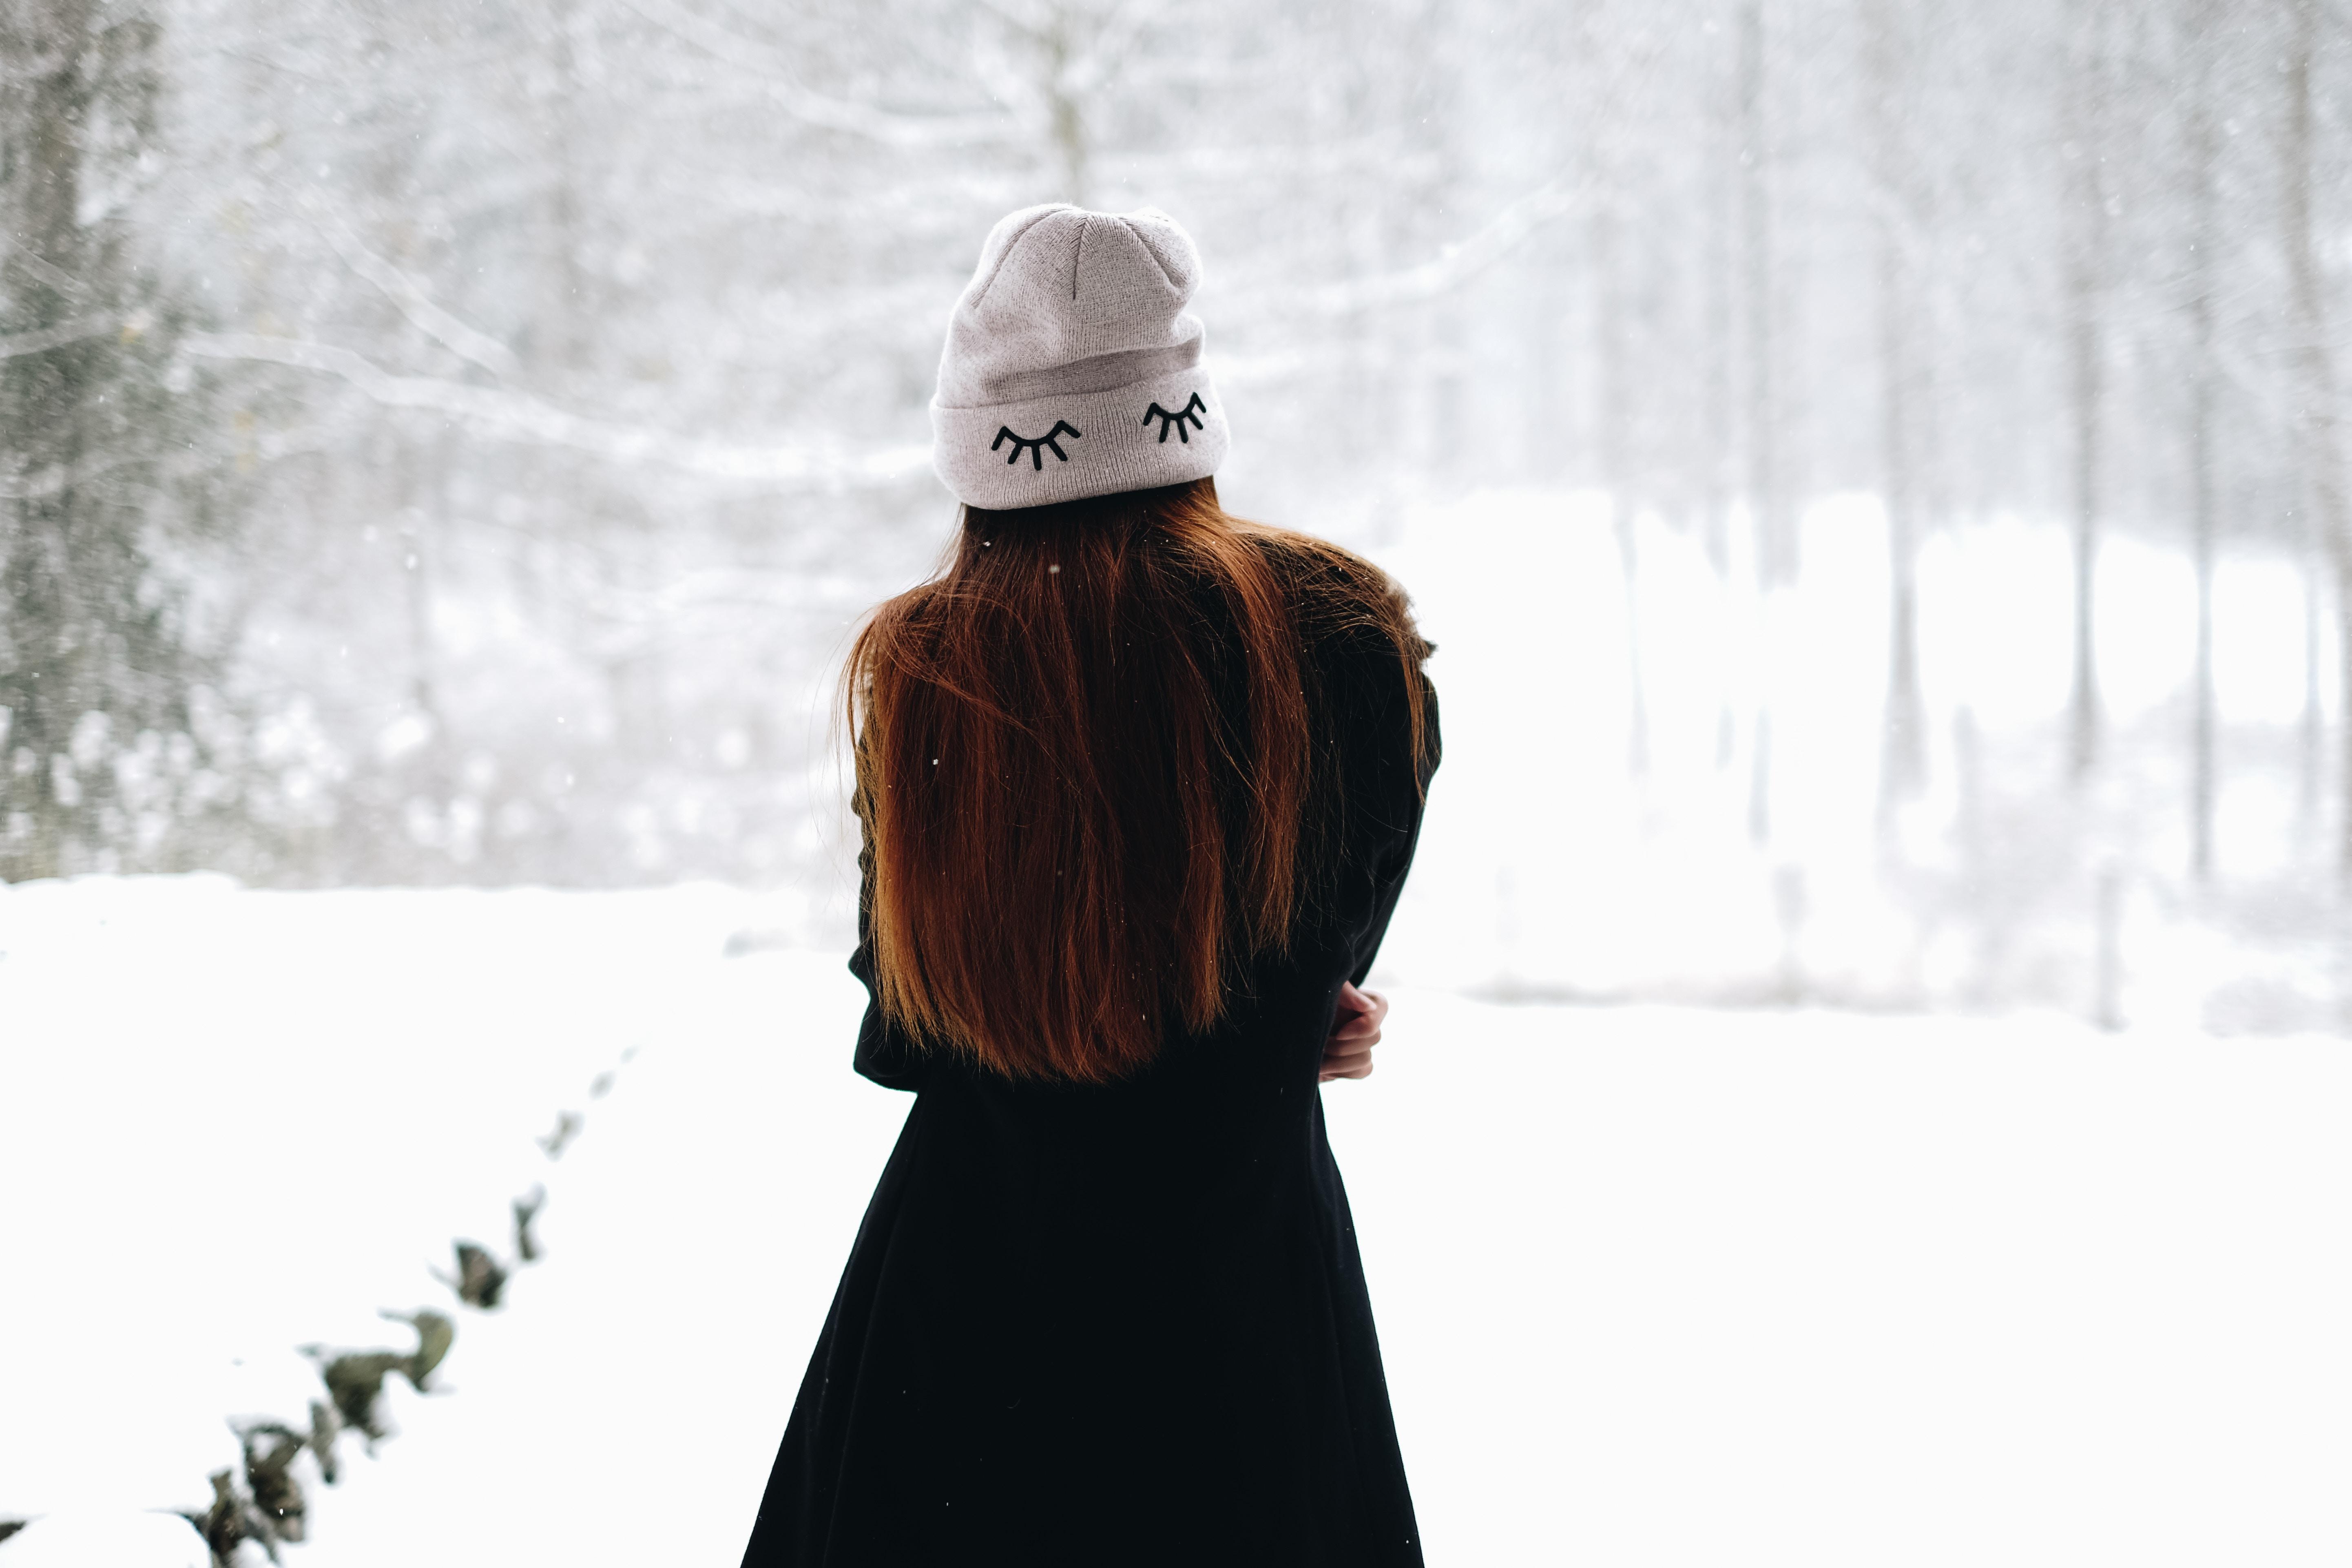 Картинка девочки зимой на аву